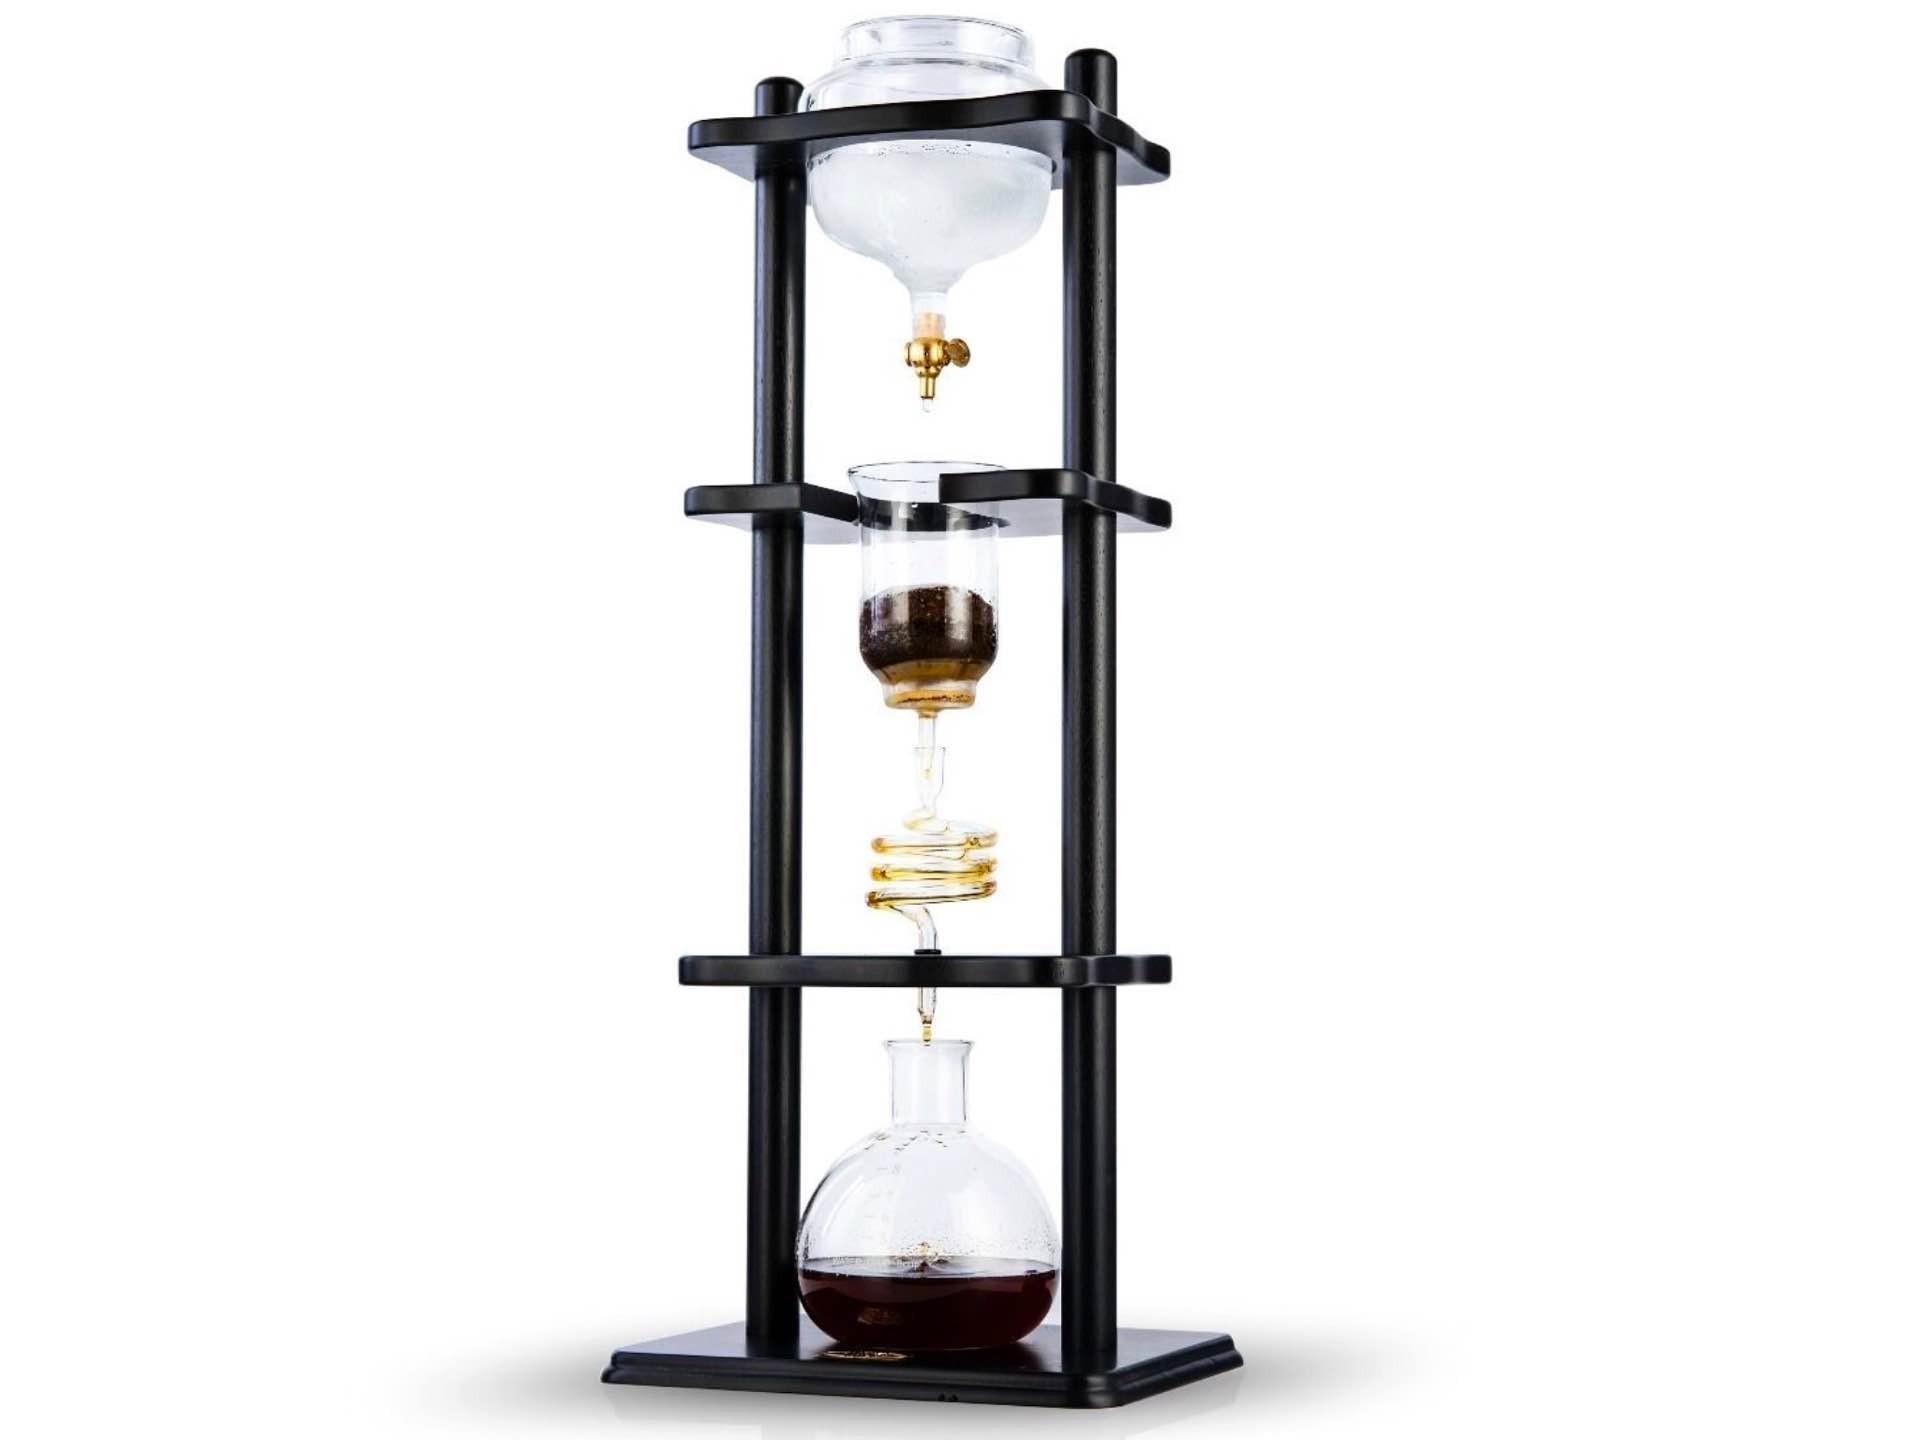 yama-glass-cold-brew-coffee-tower